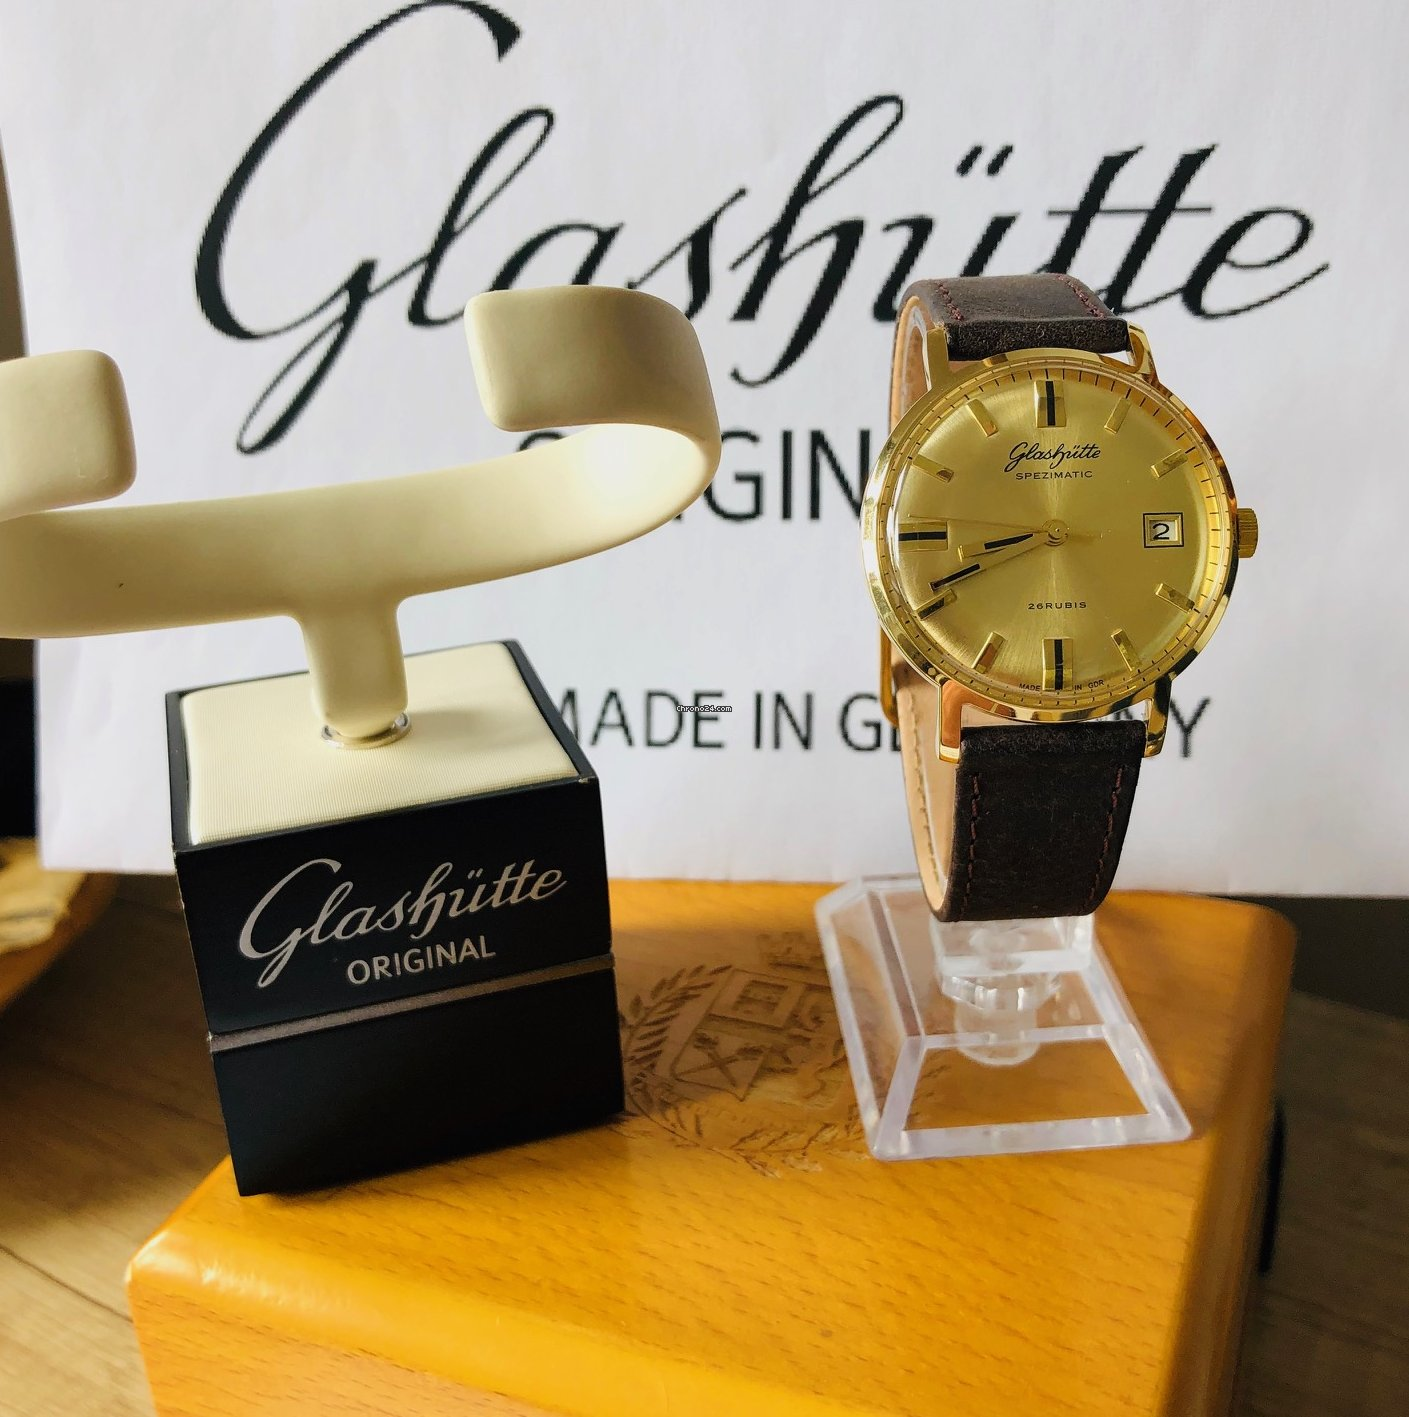 glashütte uhr gold plaque